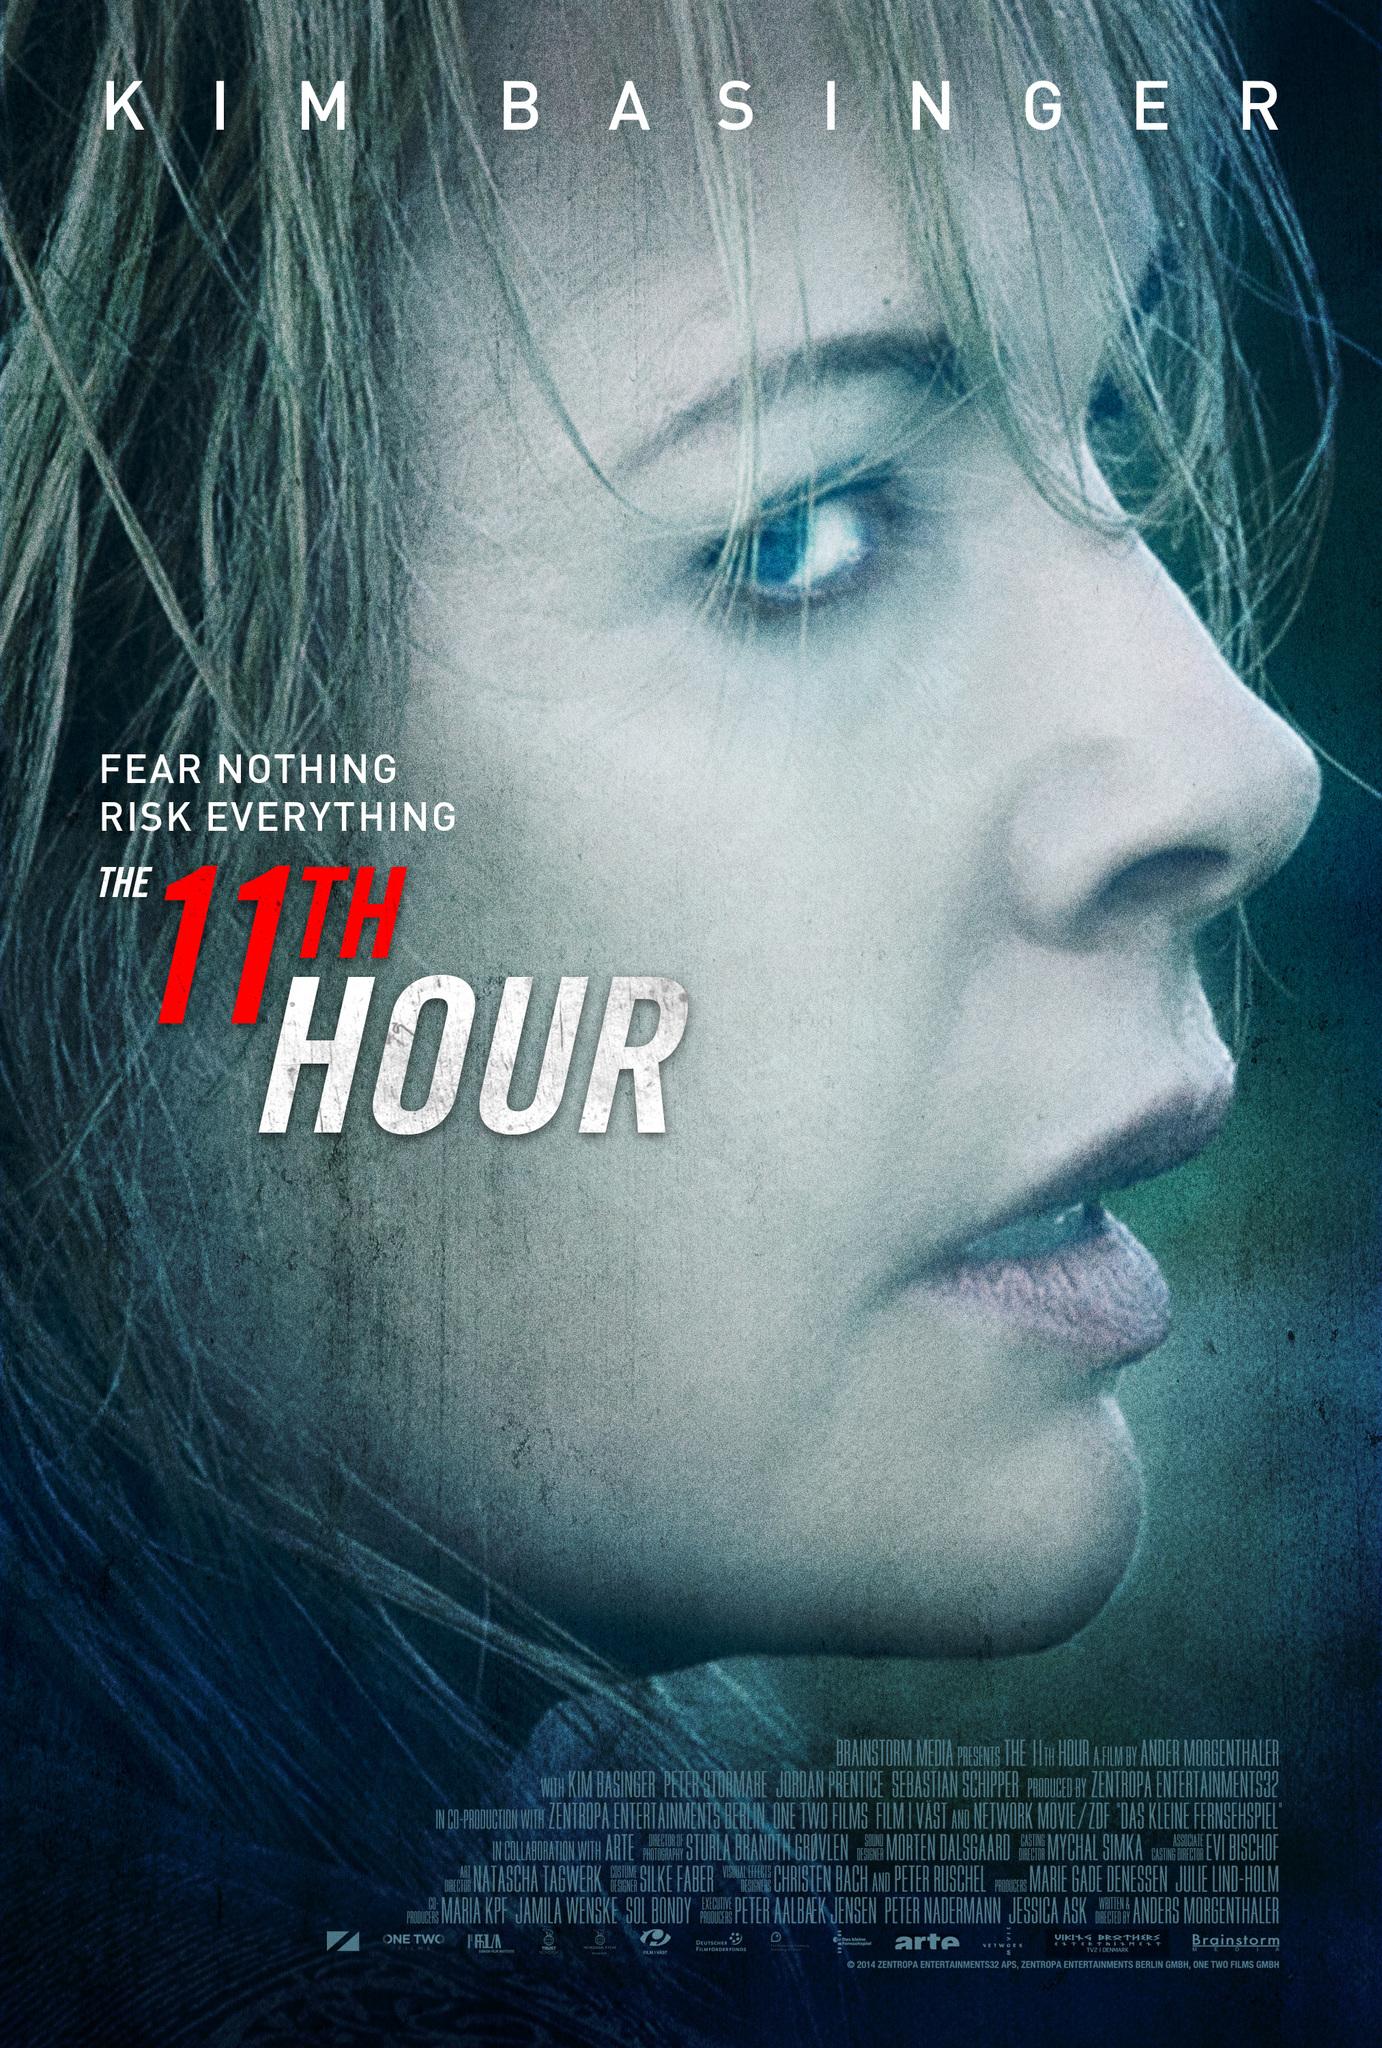 The 11th Hour kapak